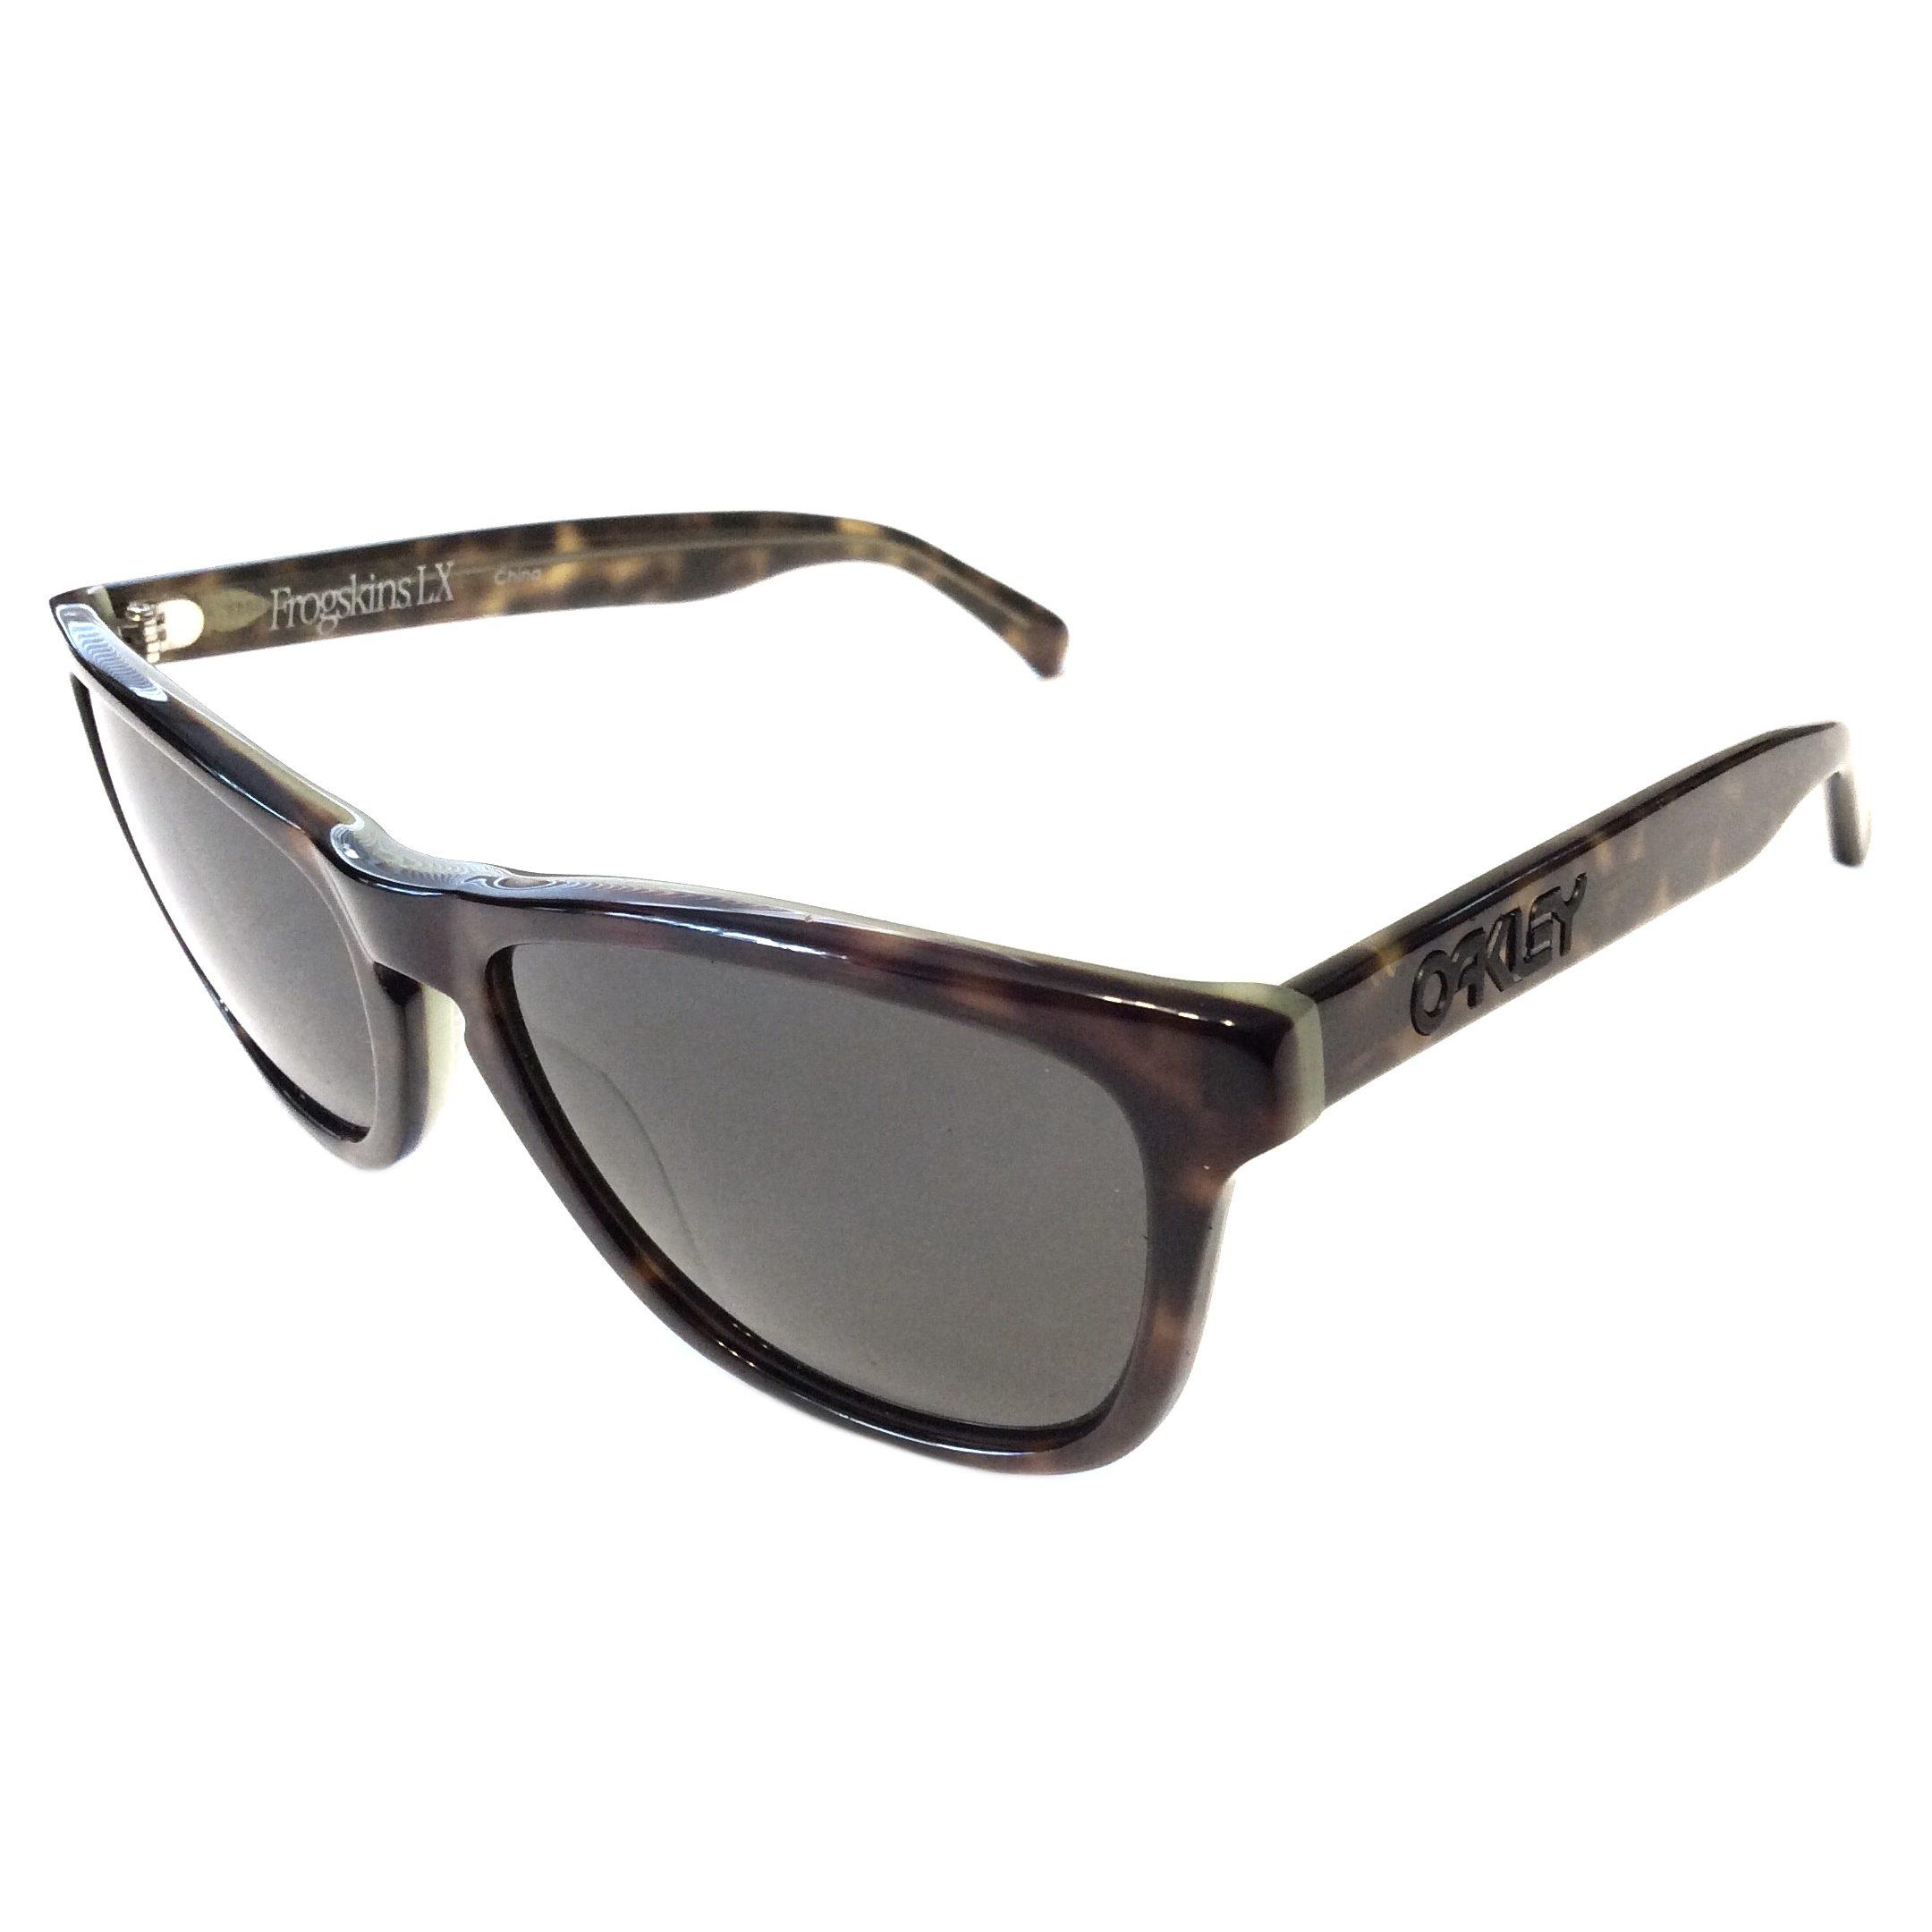 c7748da3c27 Oakley Frogskins LX Sunglasses - Tortoise Green Frame - Dark Grey OO2043-07